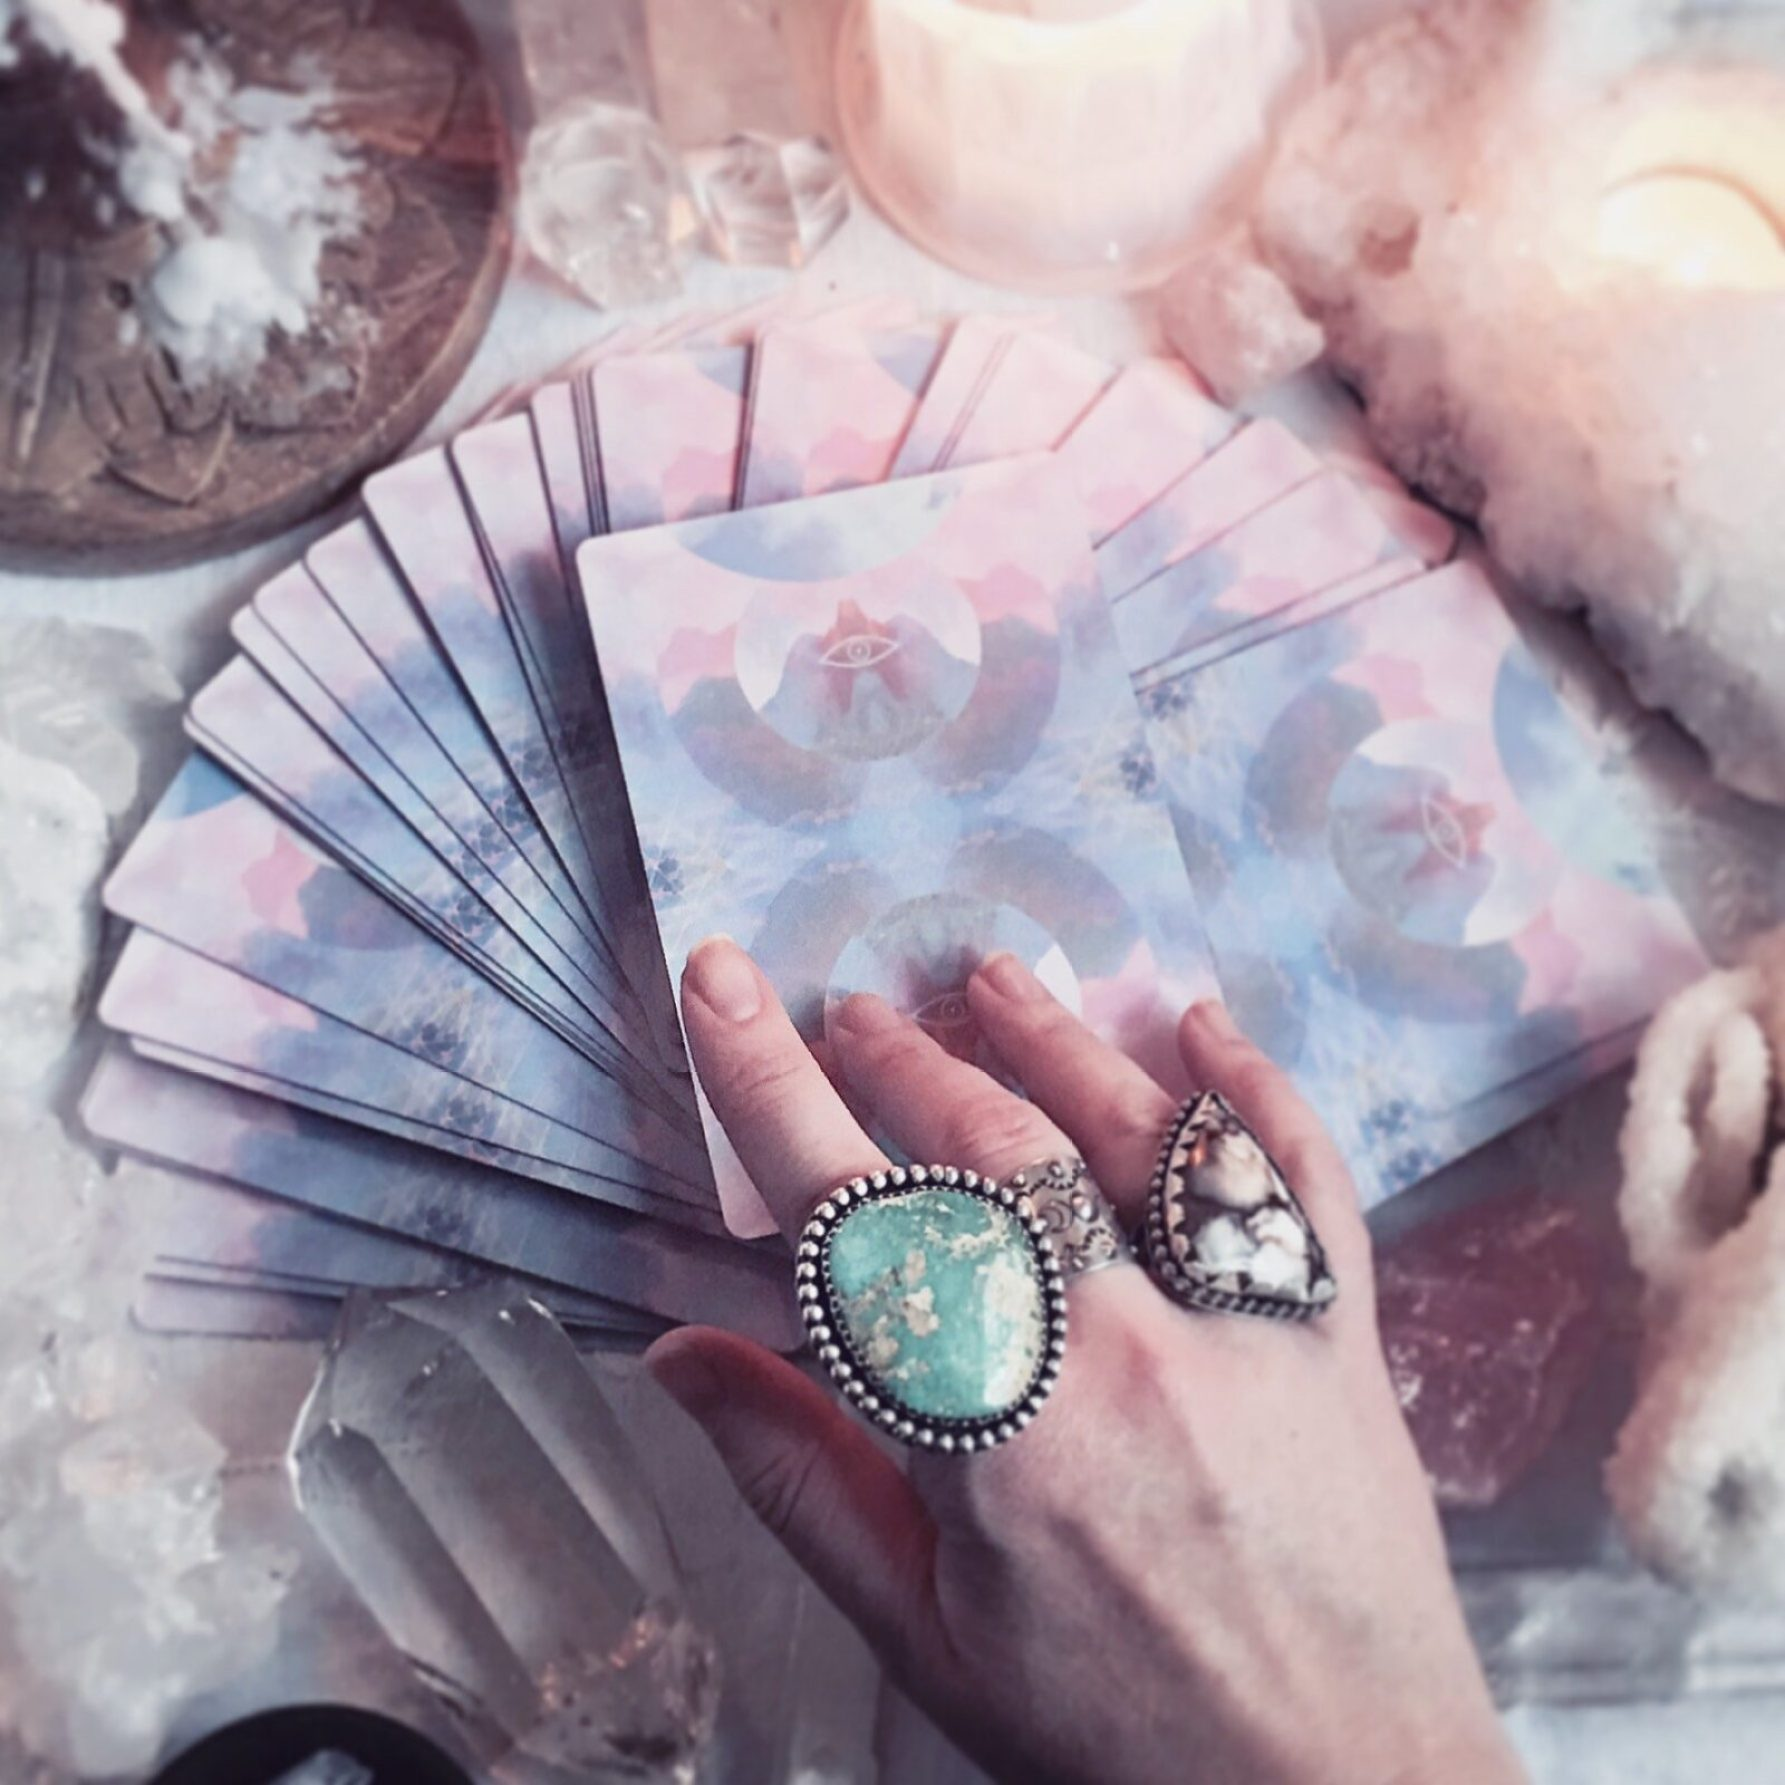 most beautiful tarot card decks - the starchild tarot deck